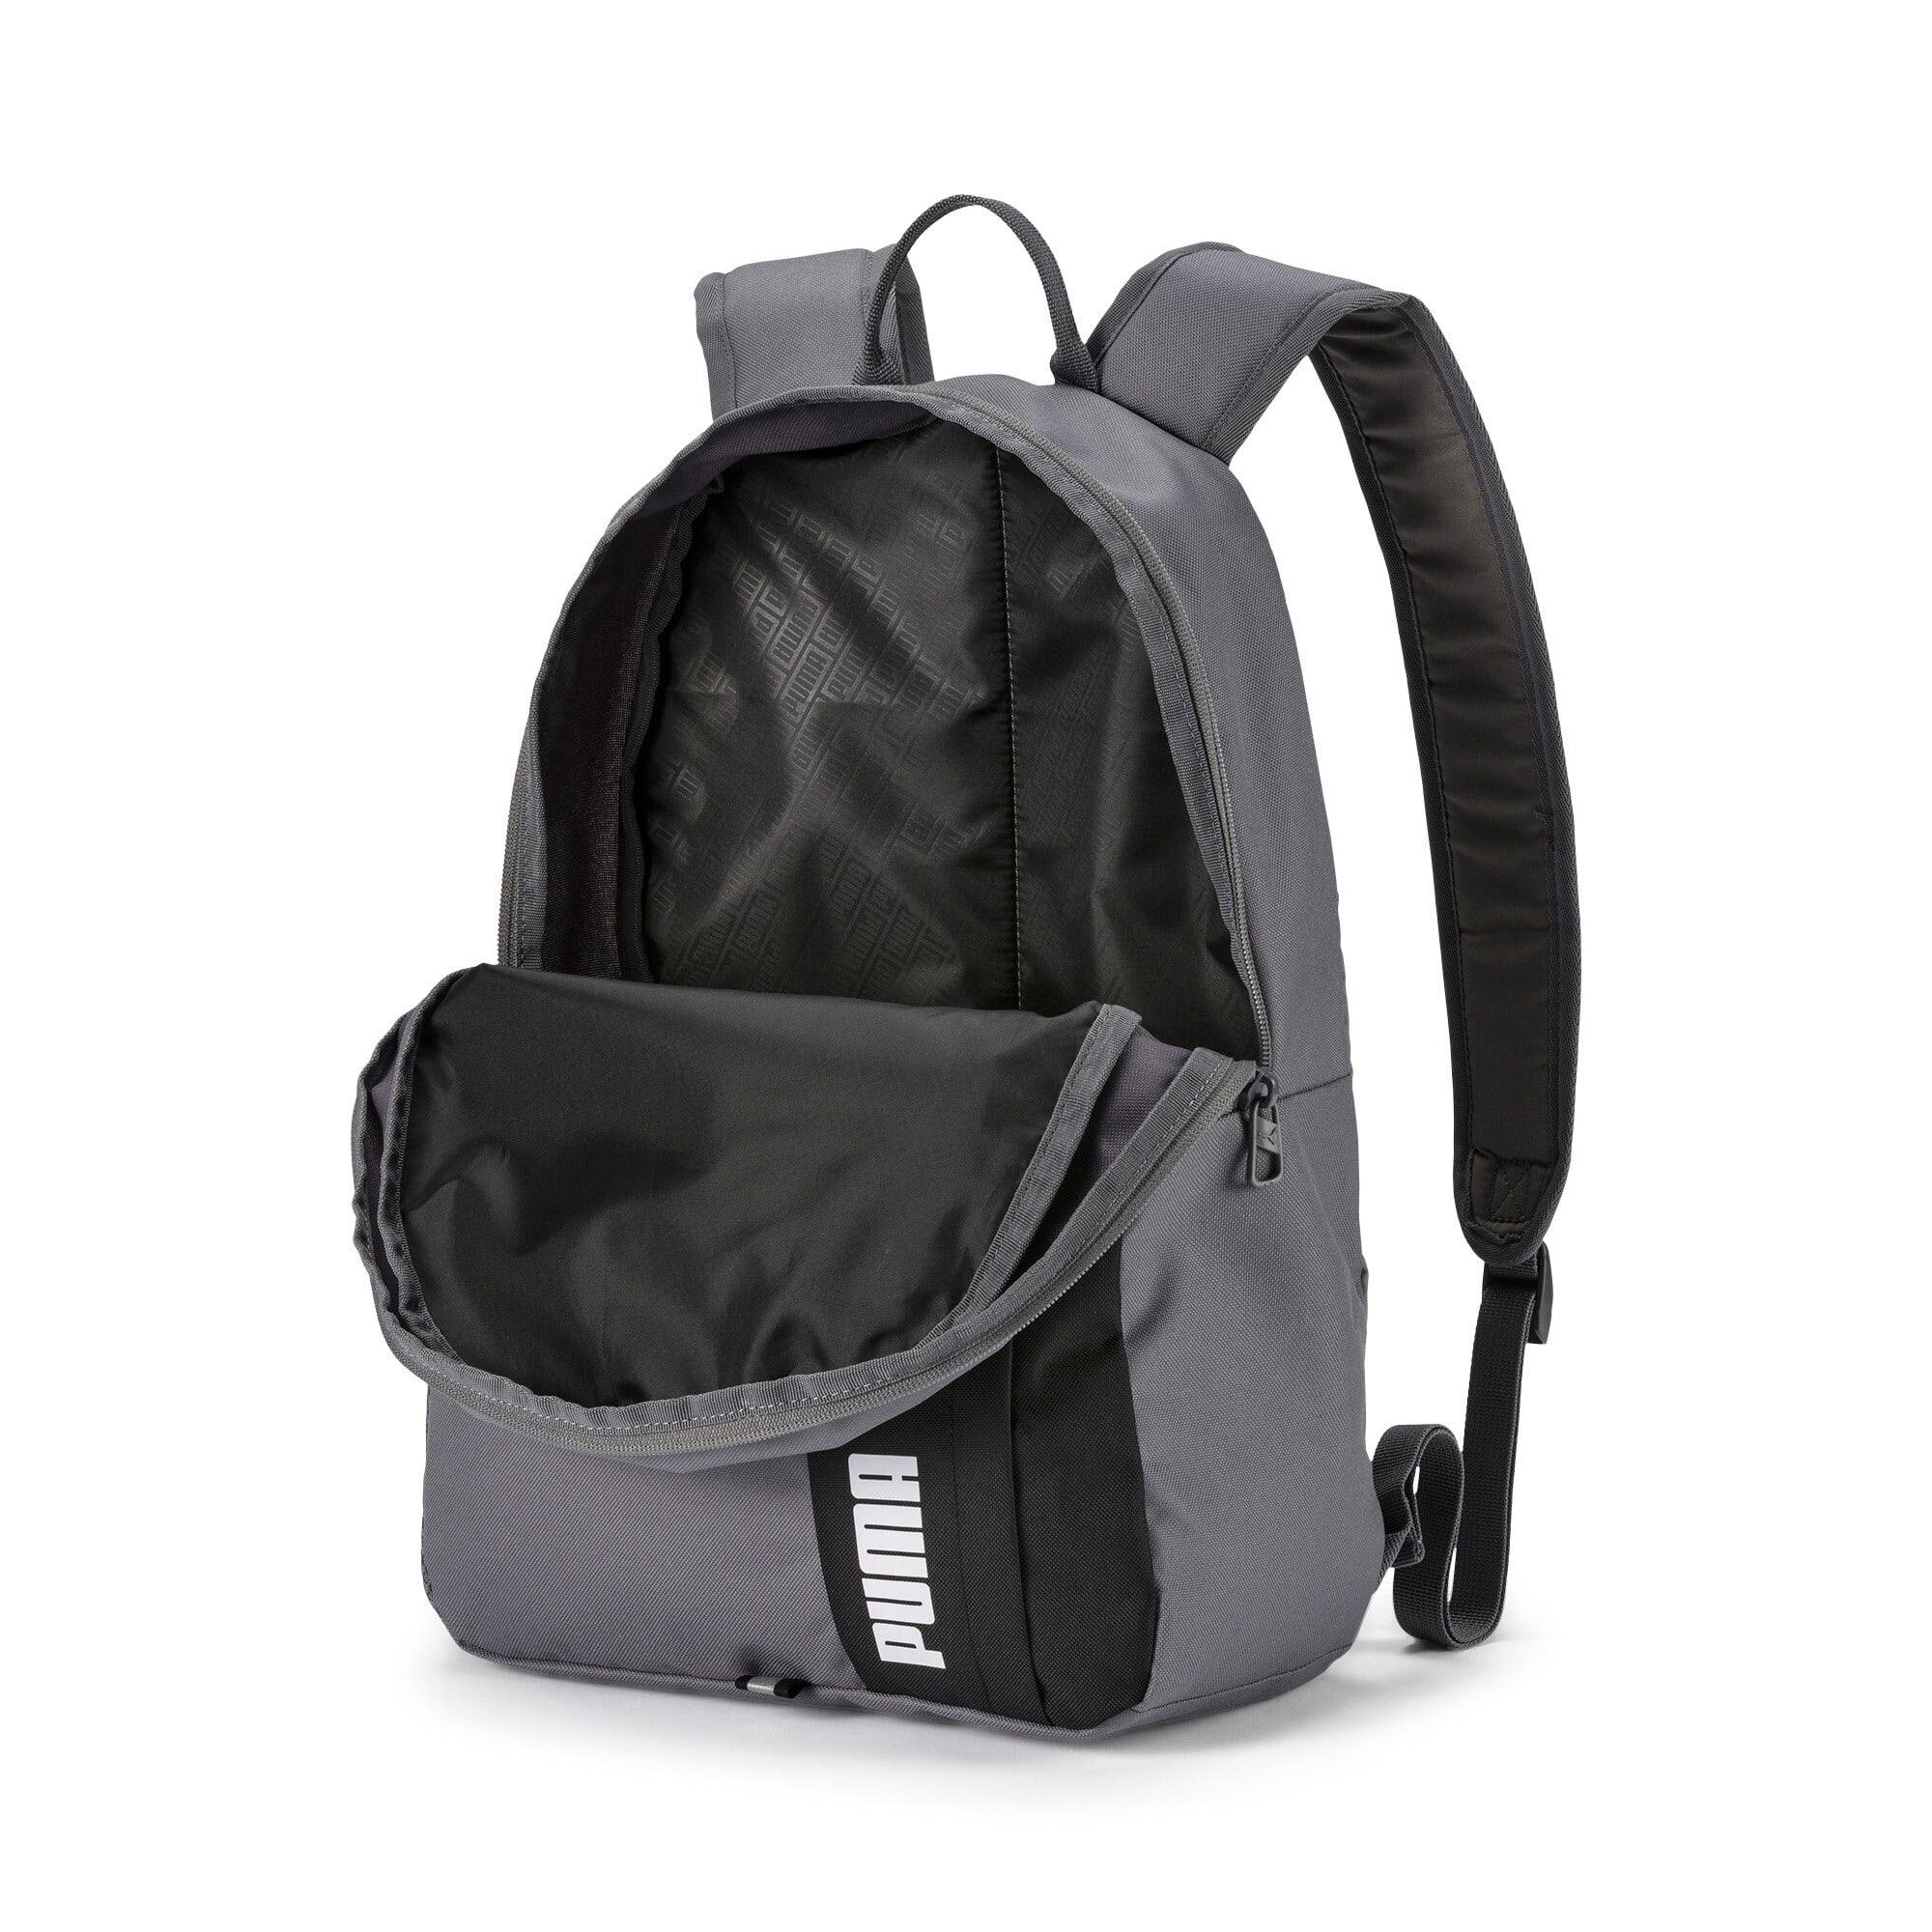 Thumbnail 3 of PUMA Phase Backpack II, CASTLEROCK, medium